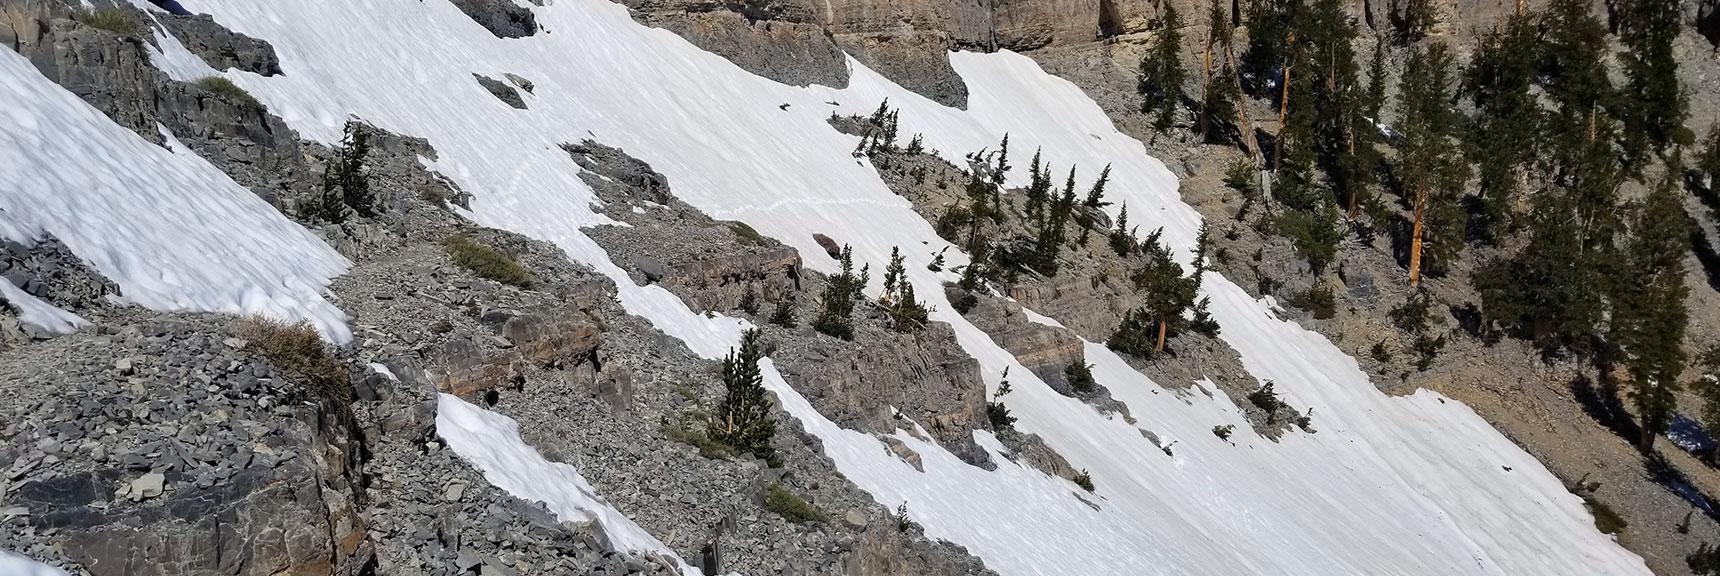 Navigating Snow Fields on North Side of Charleston Peak